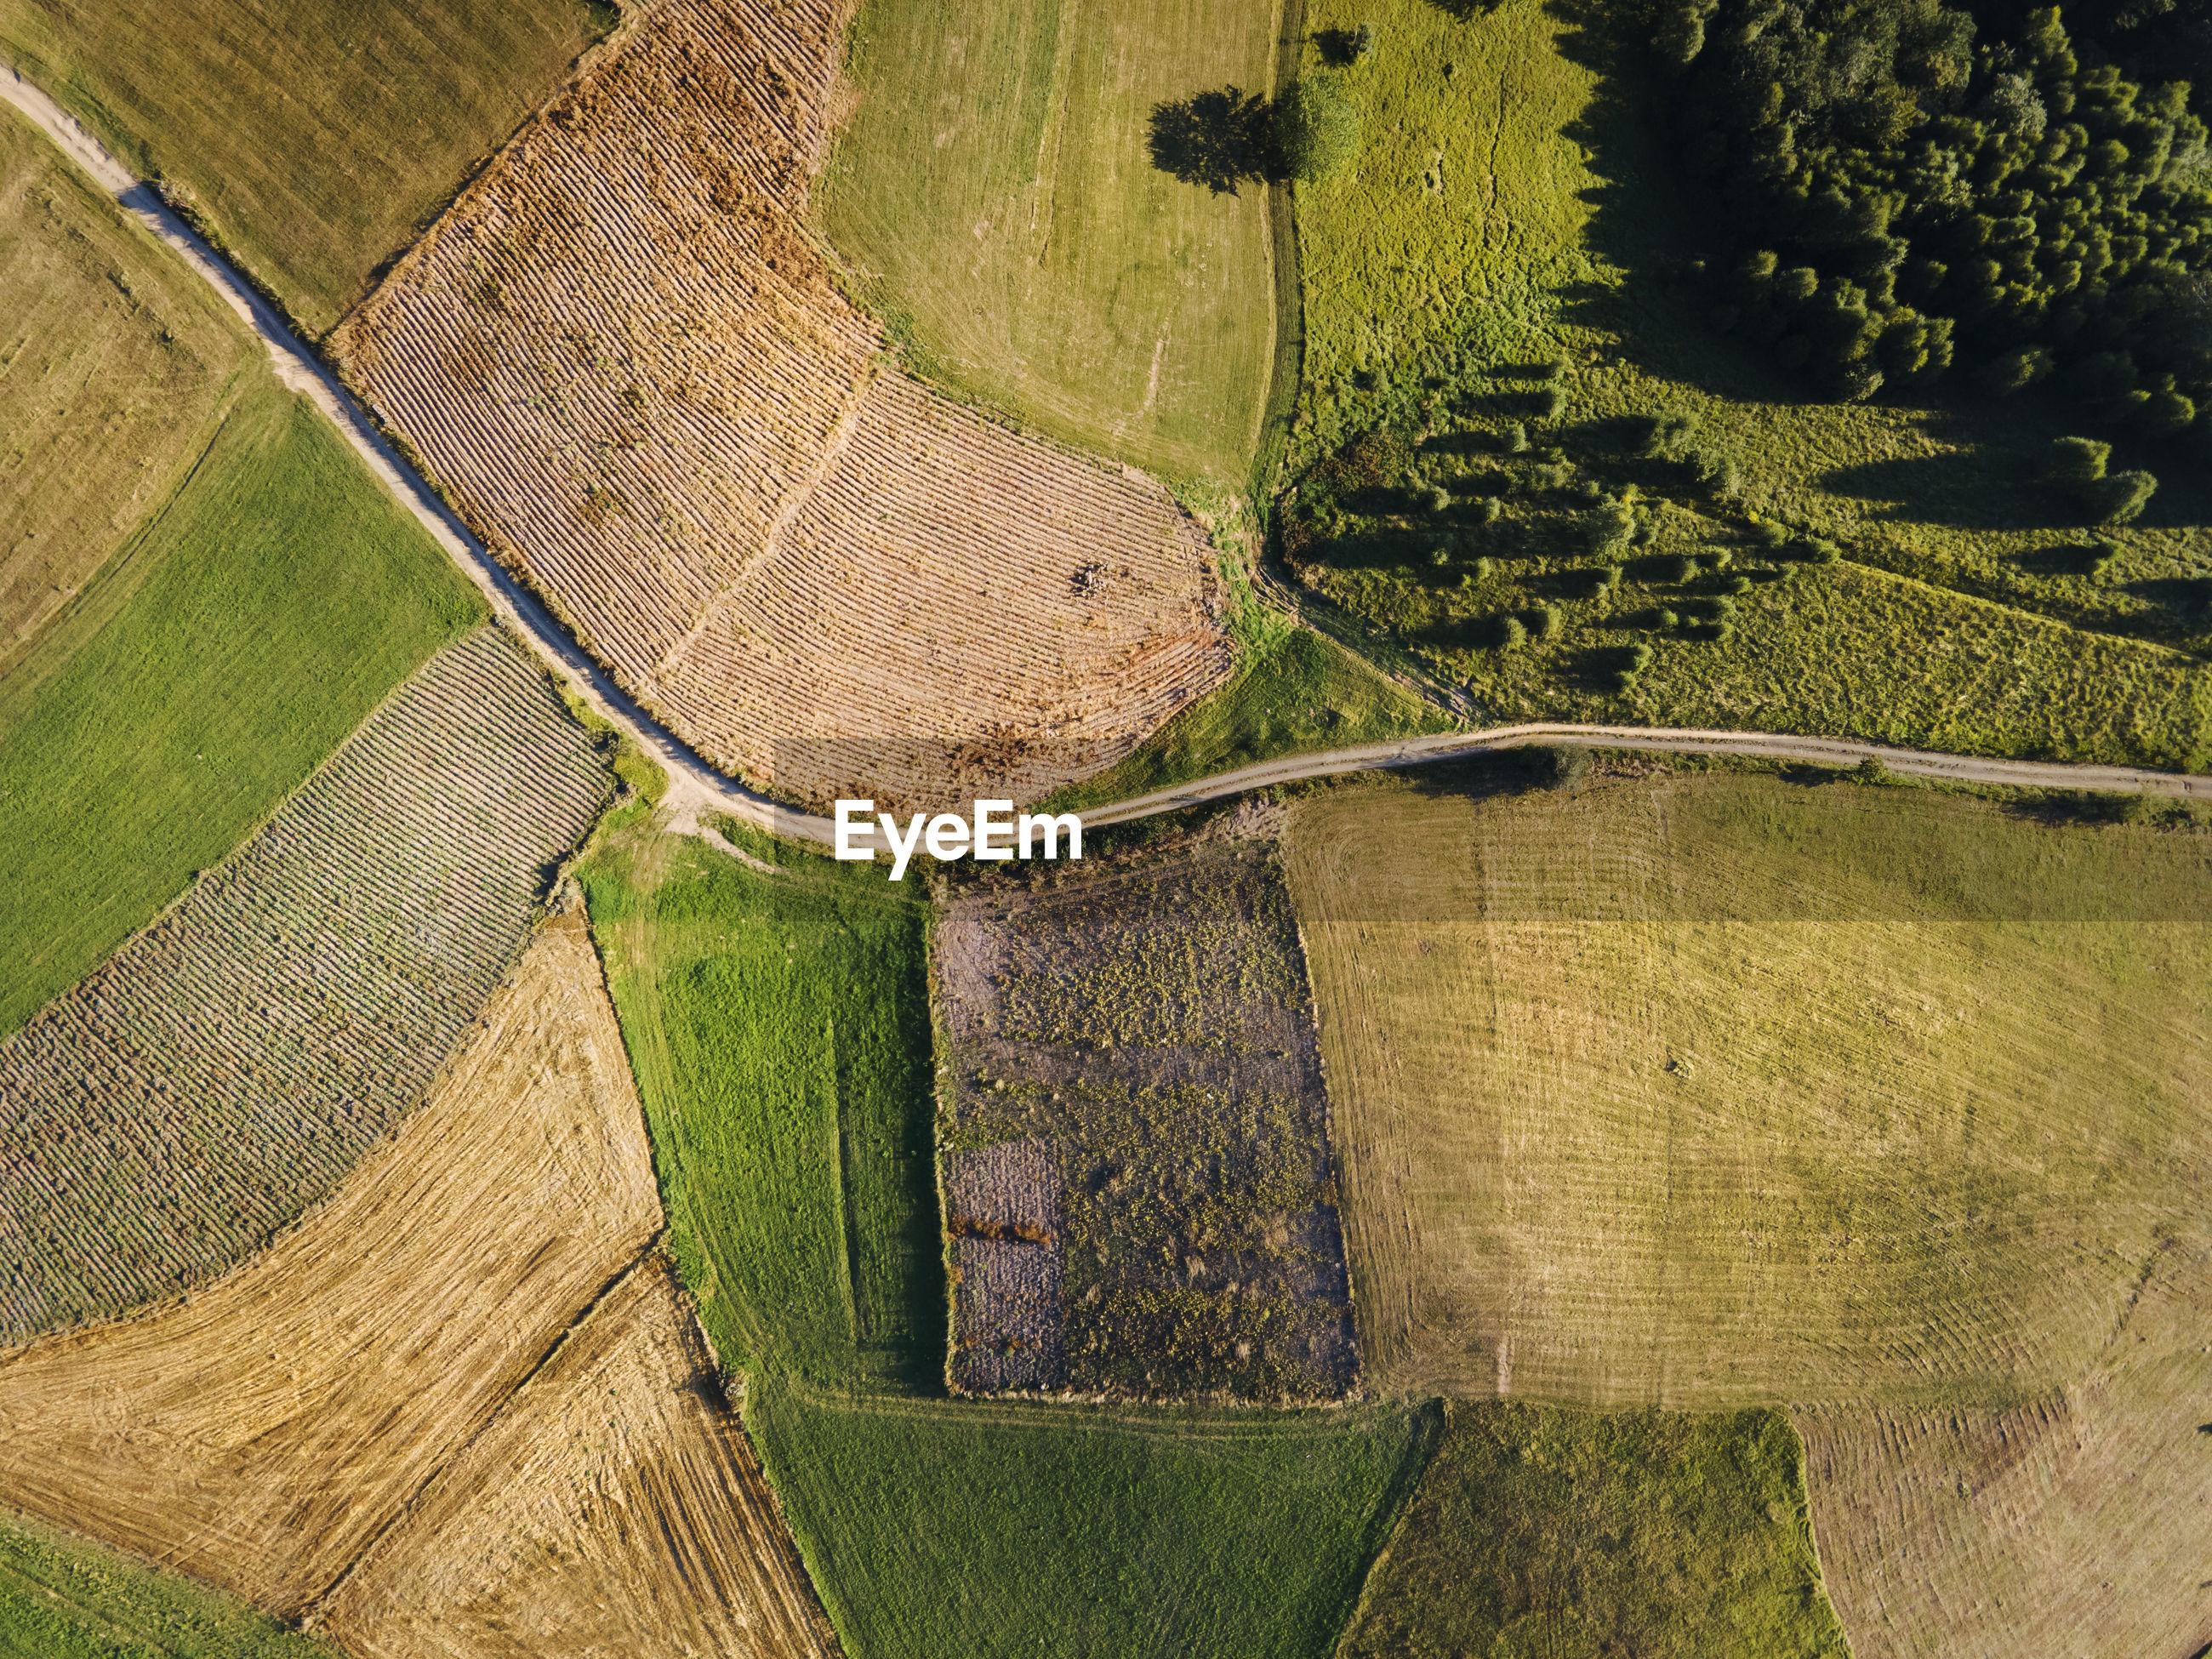 HIGH ANGLE VIEW OF FARM